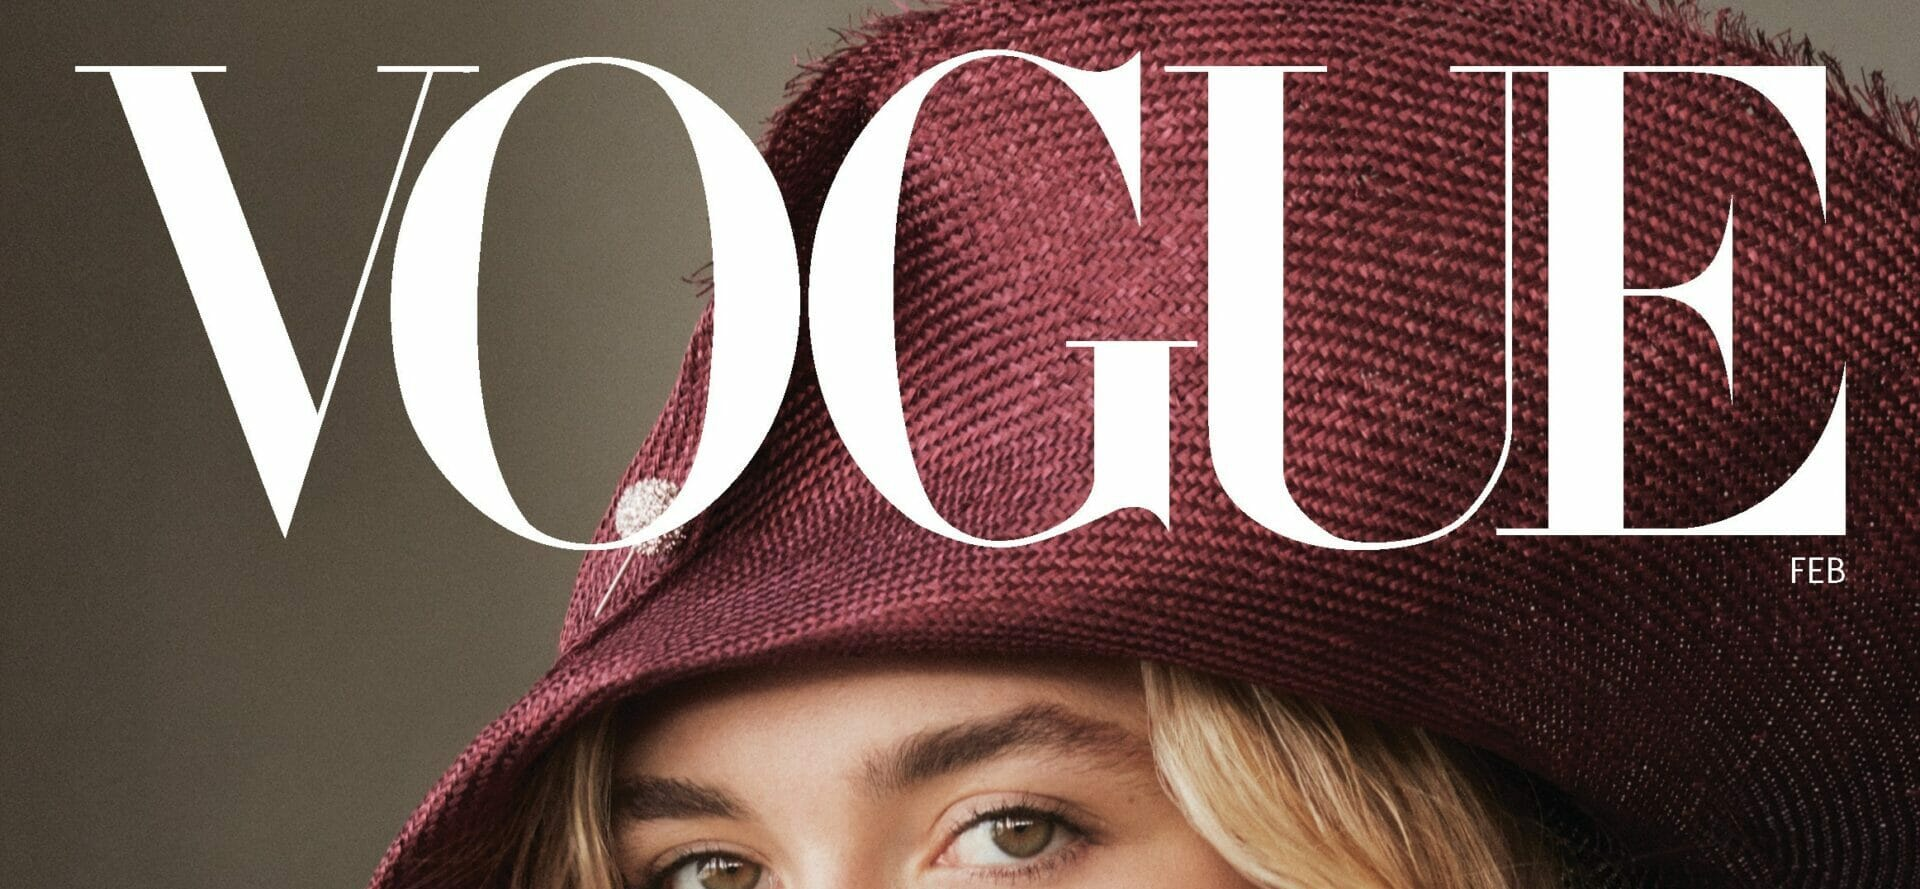 Press Release Vogue April 2020